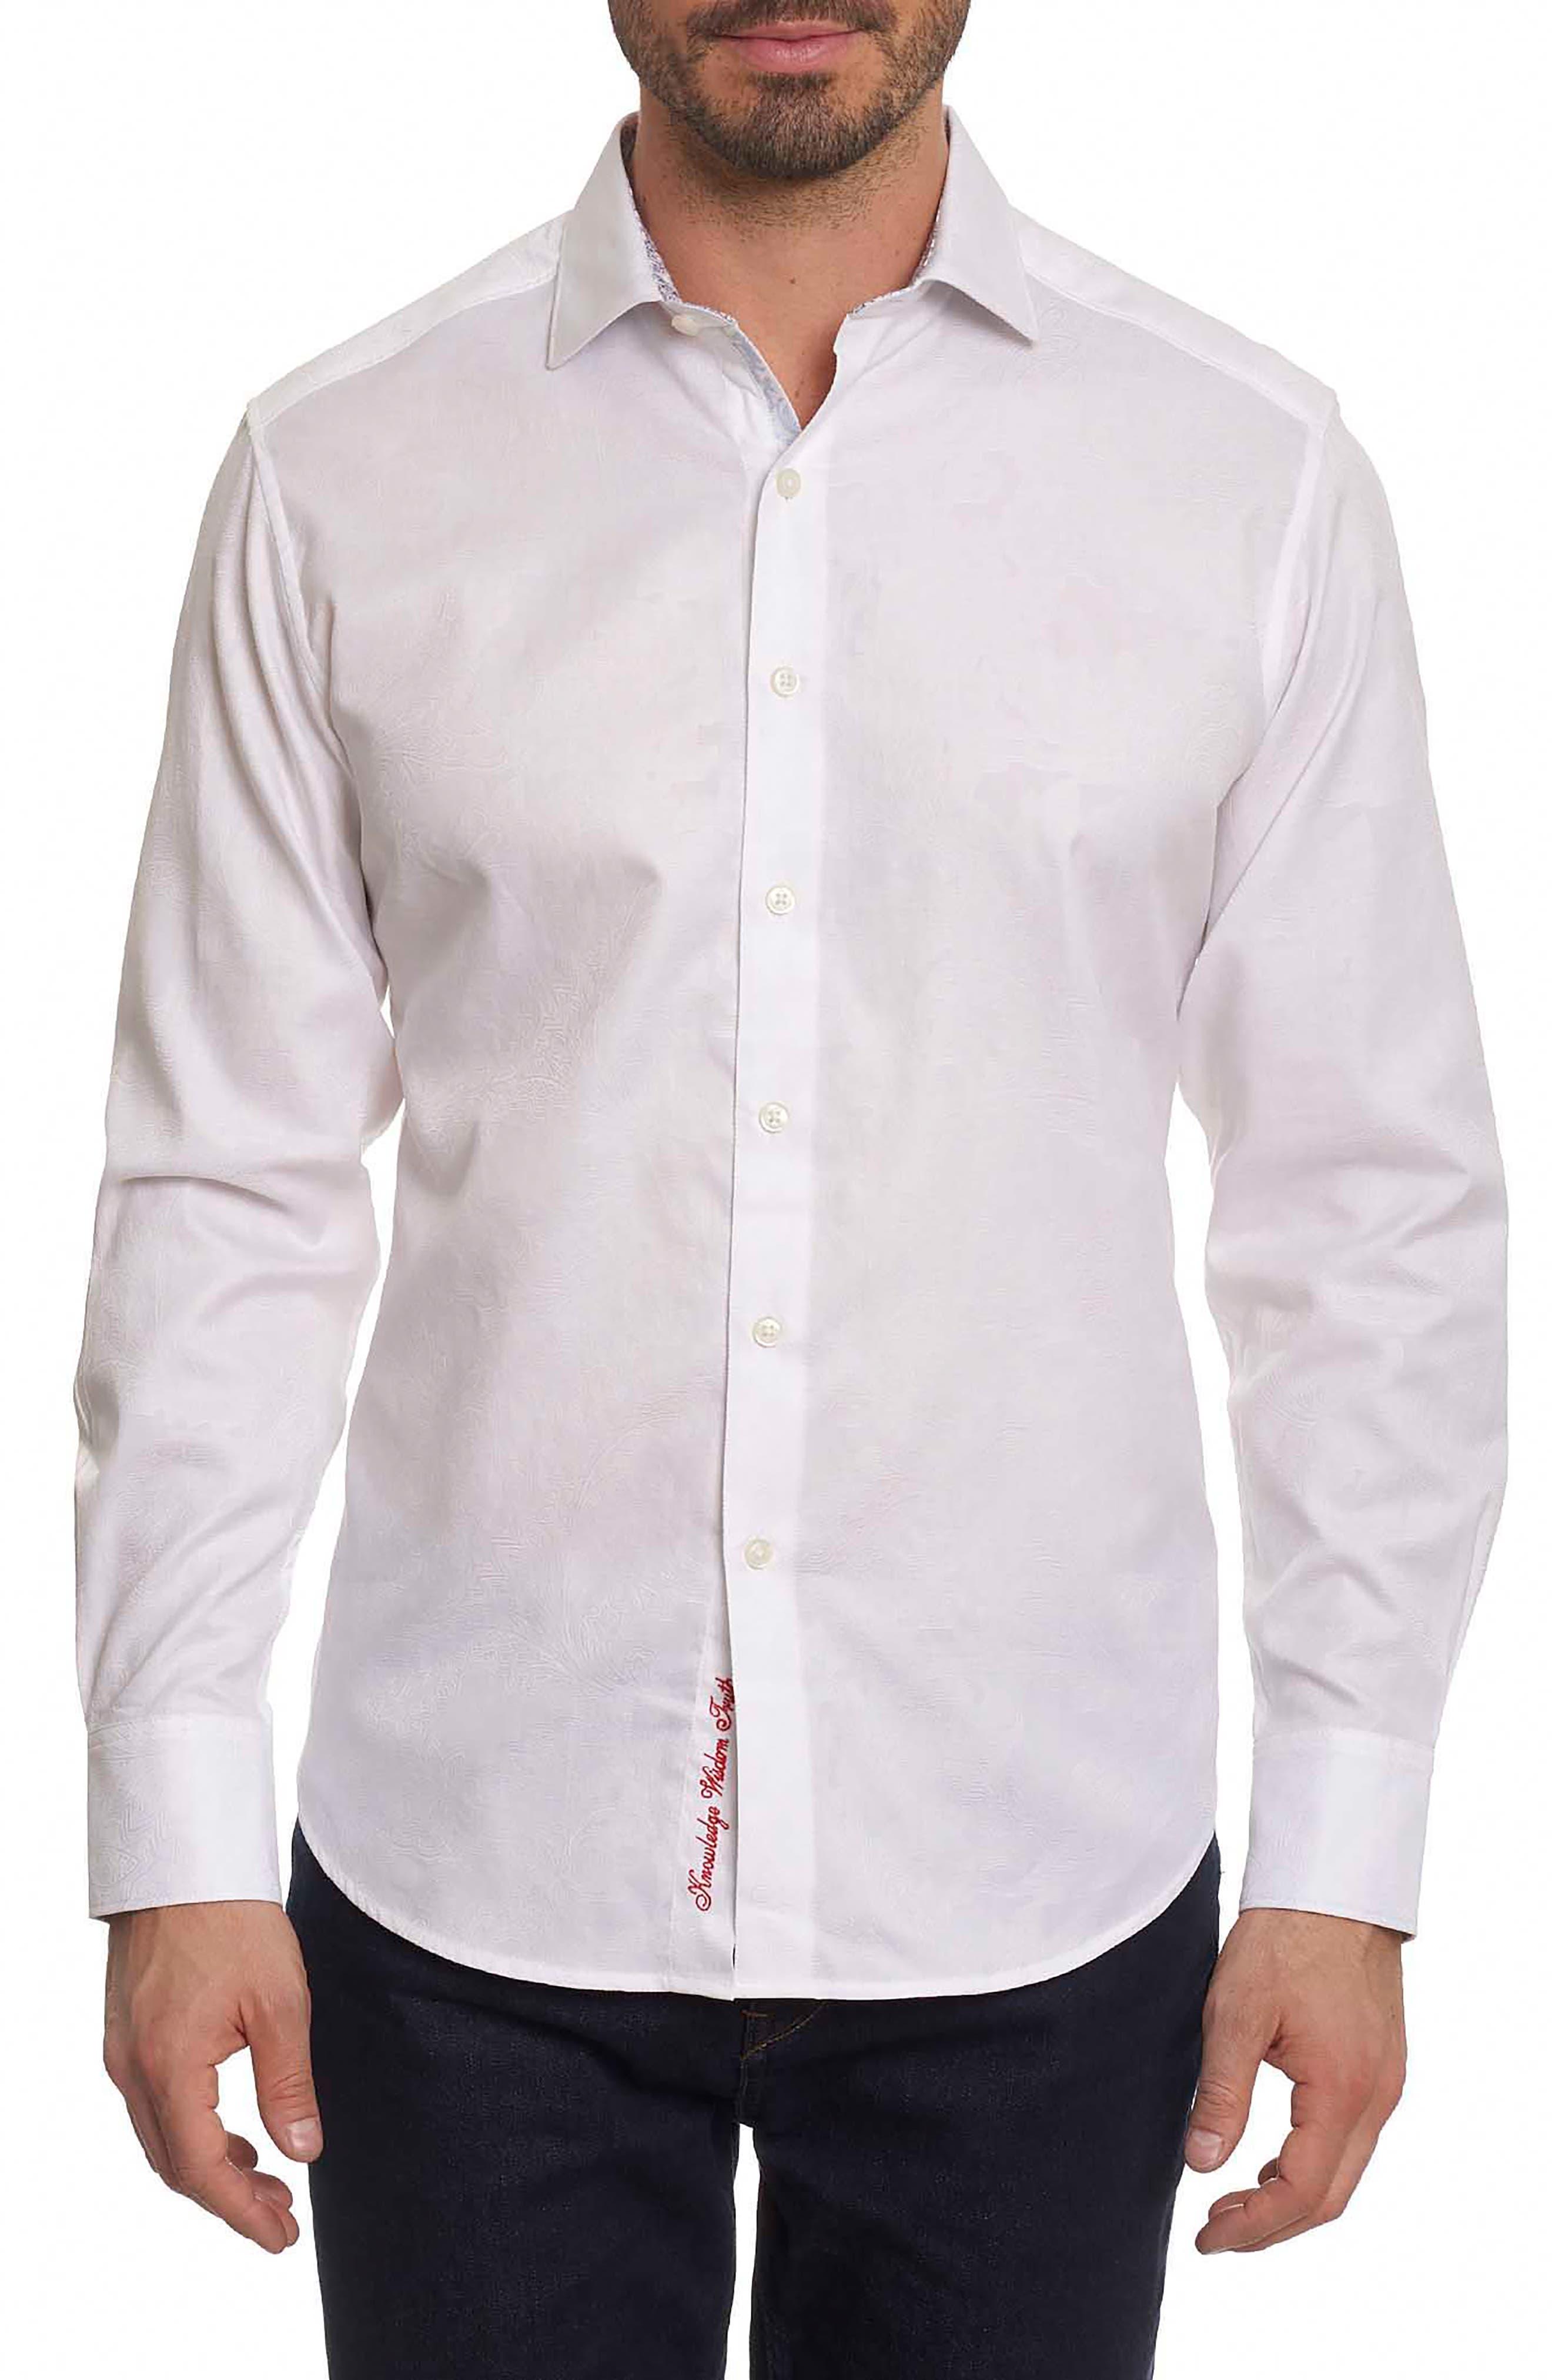 Rosendale Classic Fit Jacquard Sport Shirt,                         Main,                         color, White